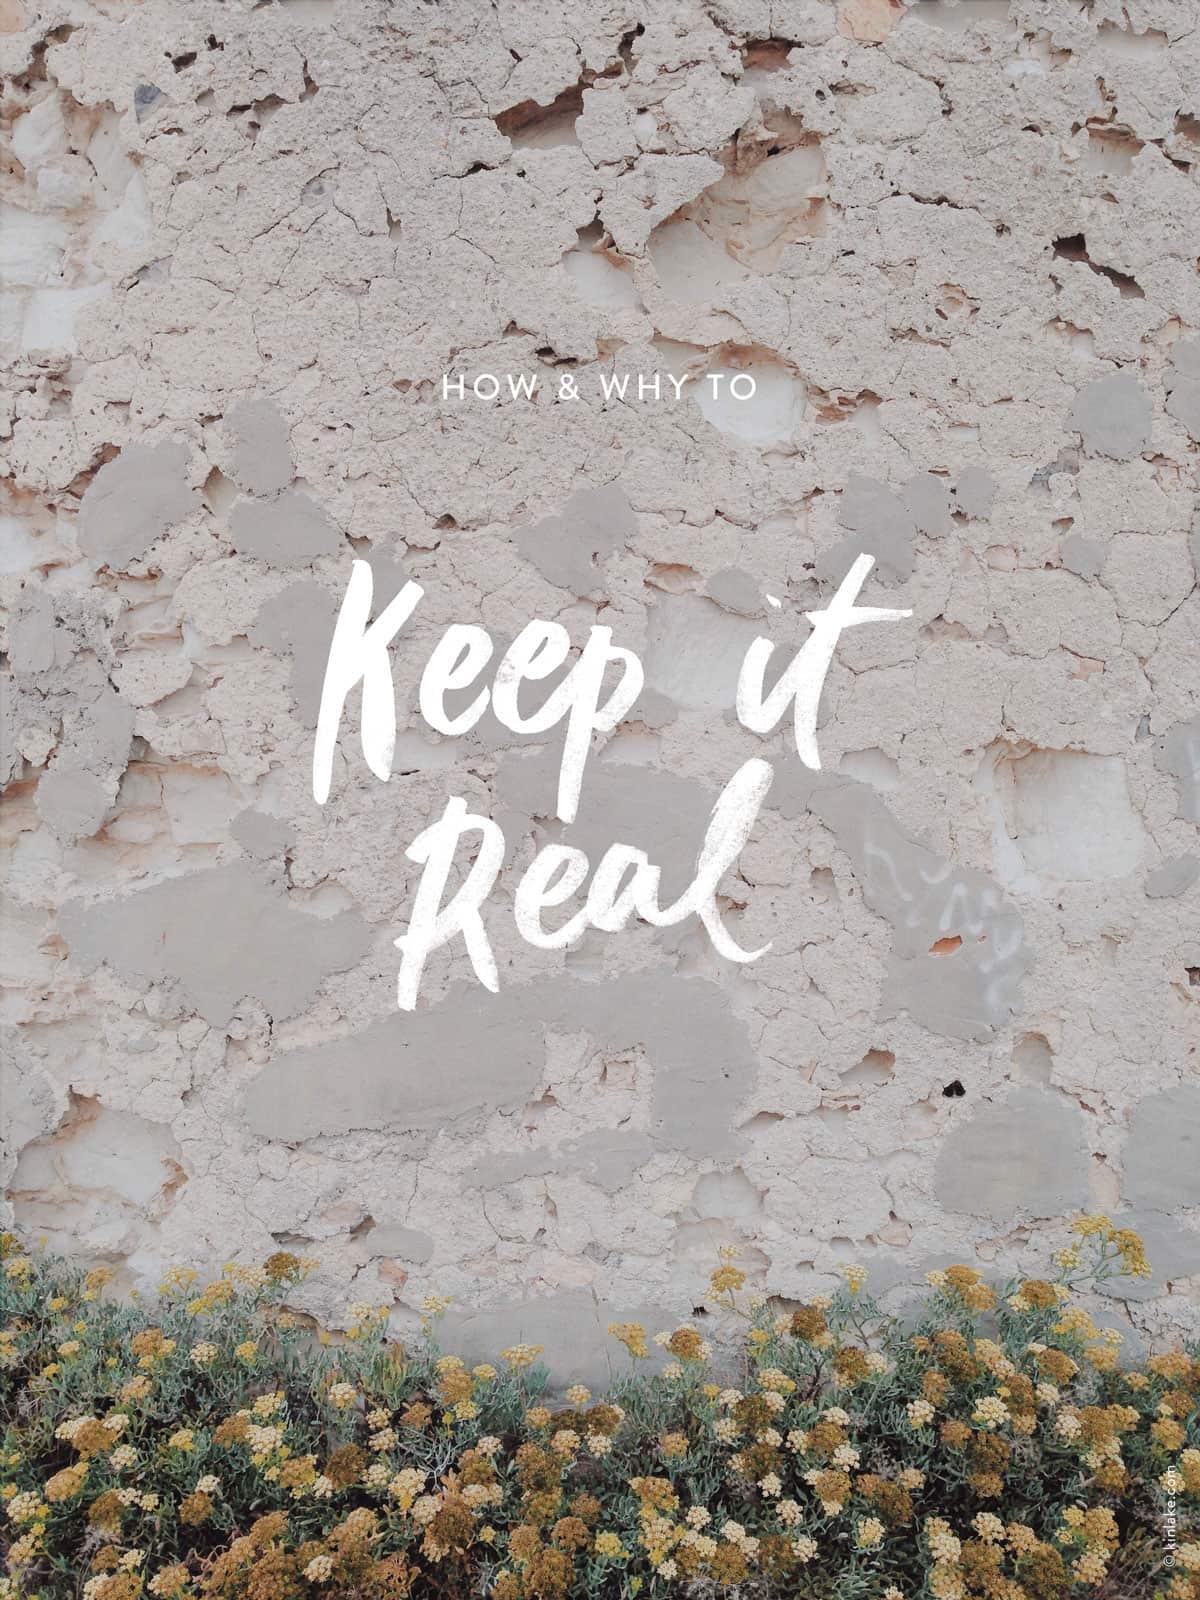 Keep-it-real-v02